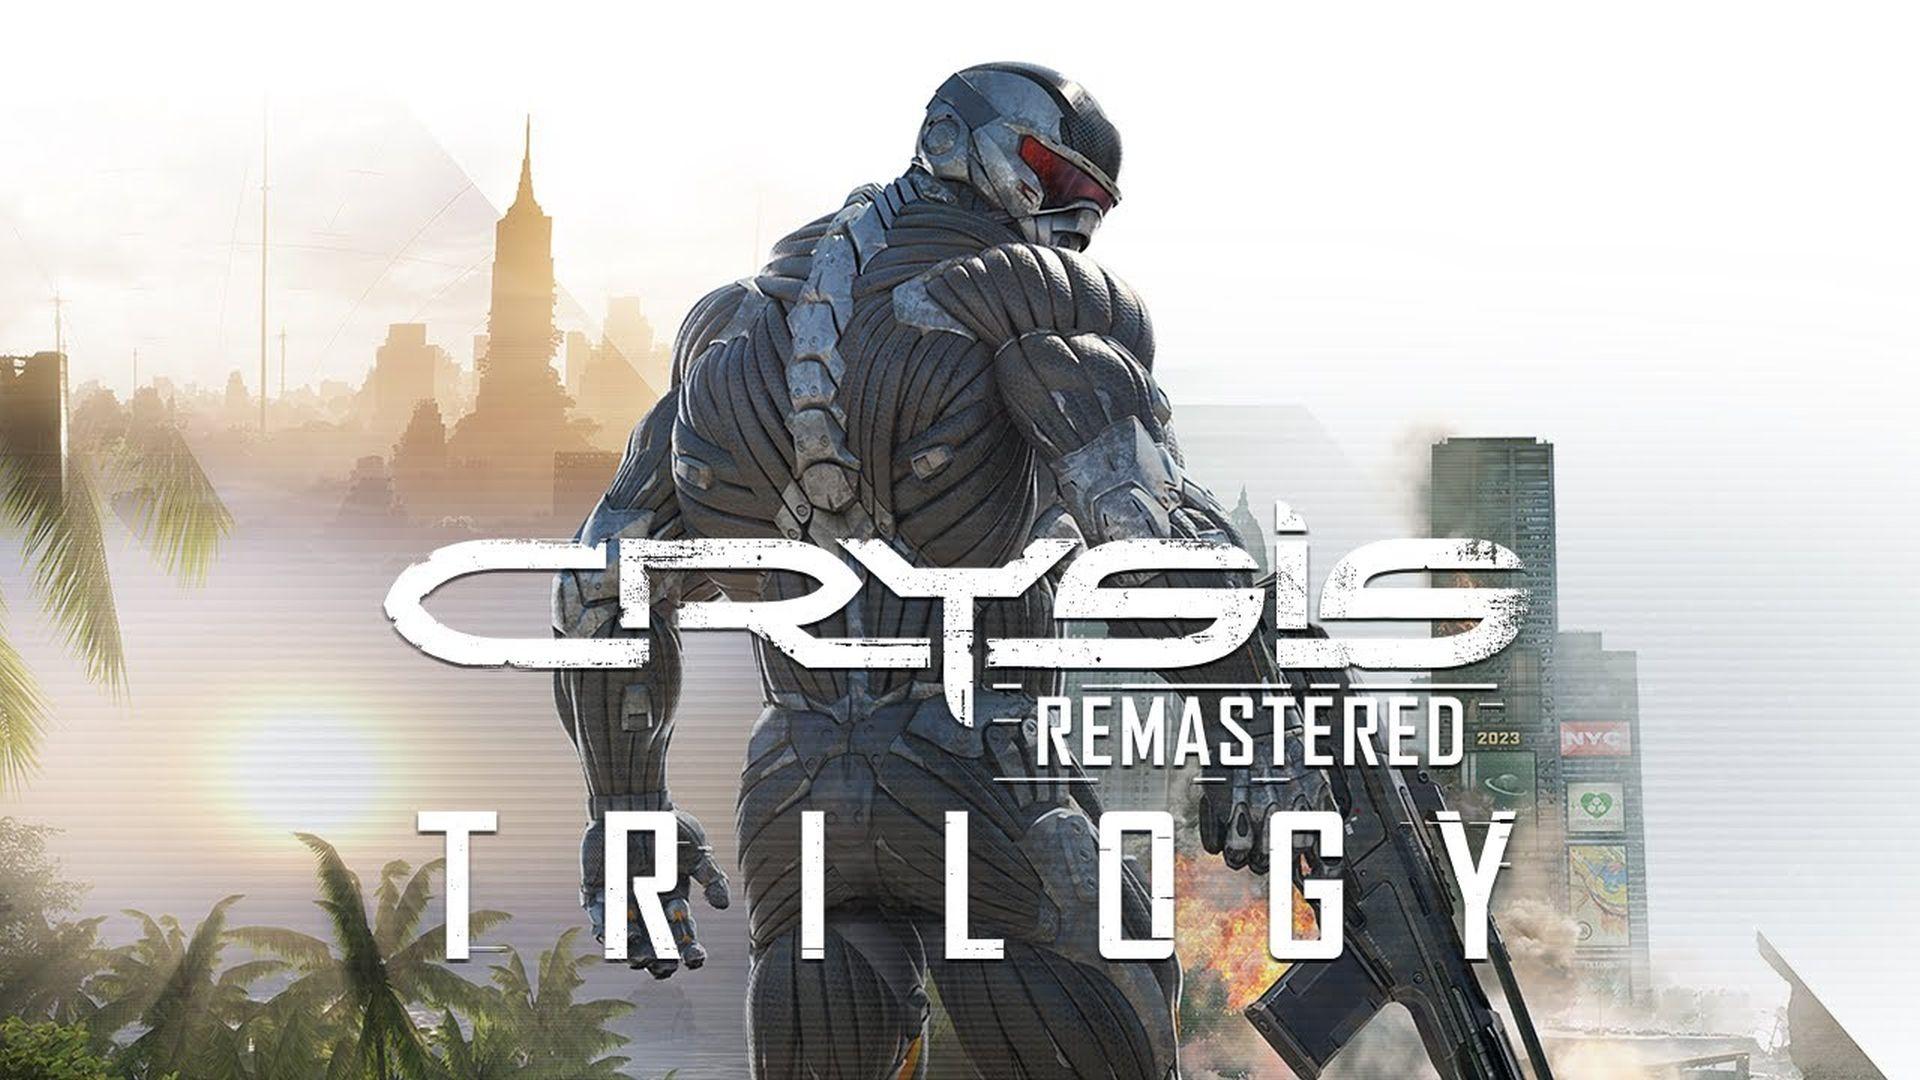 Crysis Remastered Trilogy 392021 1